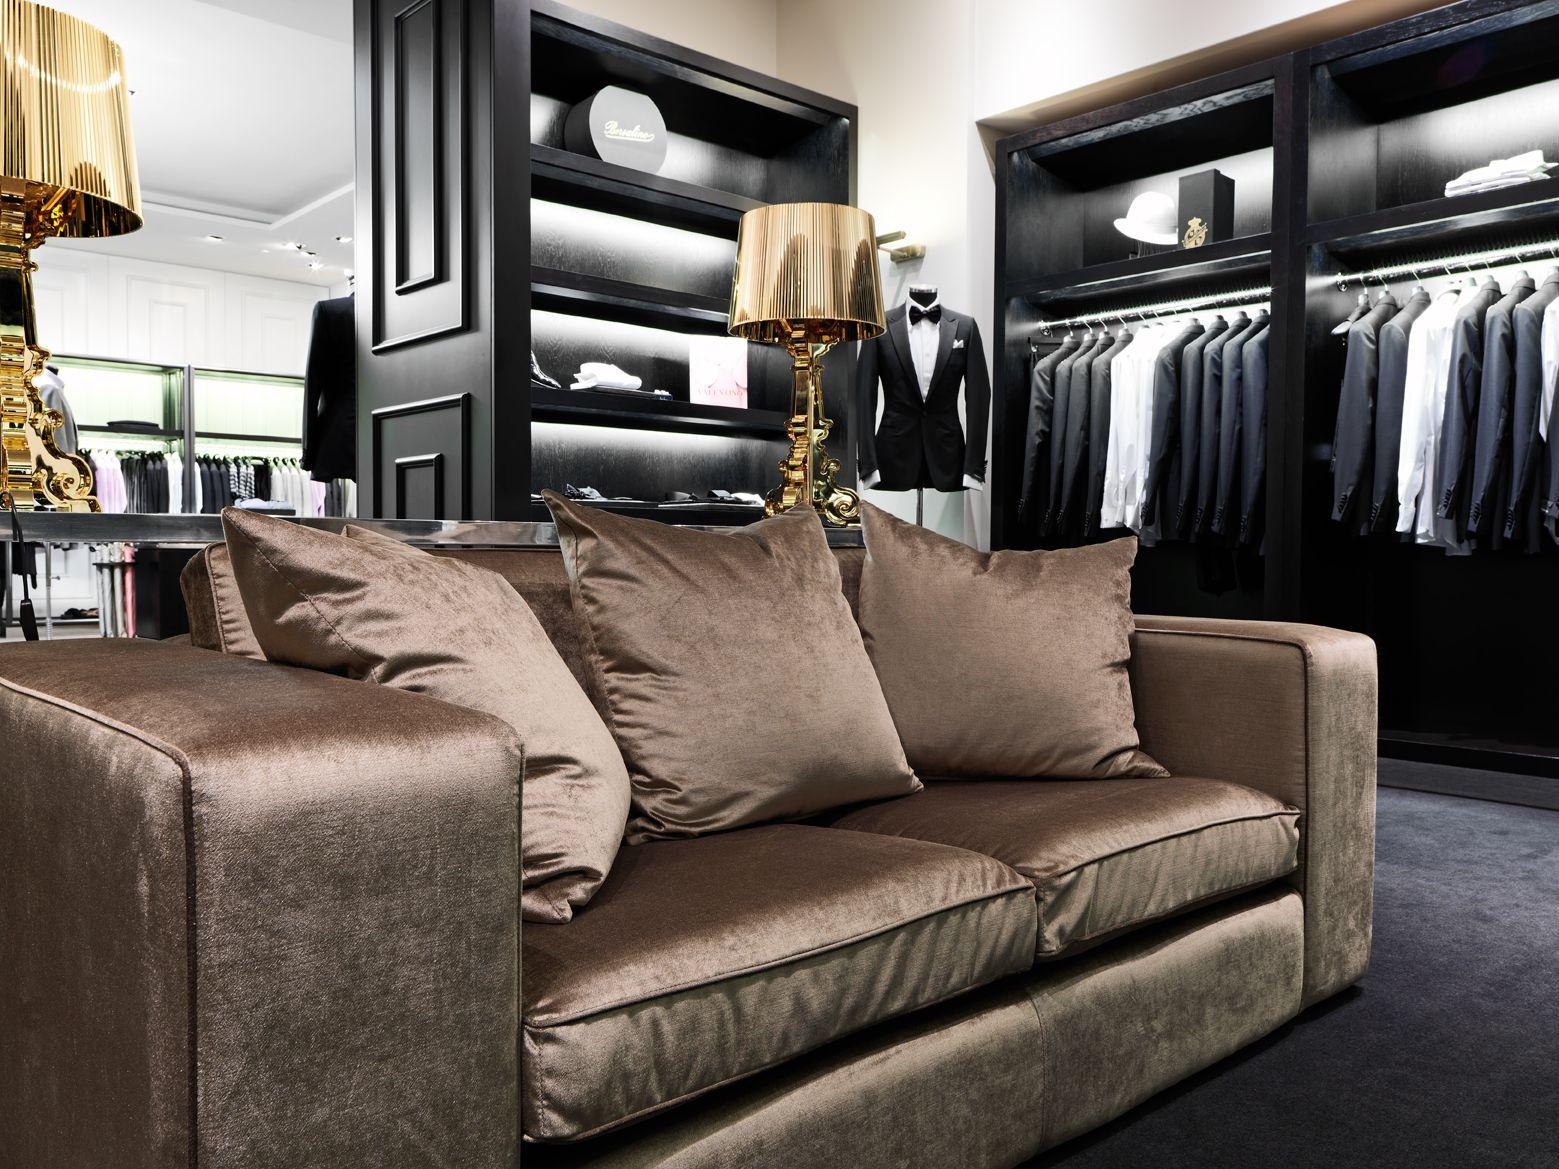 cool furniture melbourne. Photographer: Luc Remond Designer Furniture│ Sydney │ Melbourne Perth Http://arthurg.com.au Cool Furniture